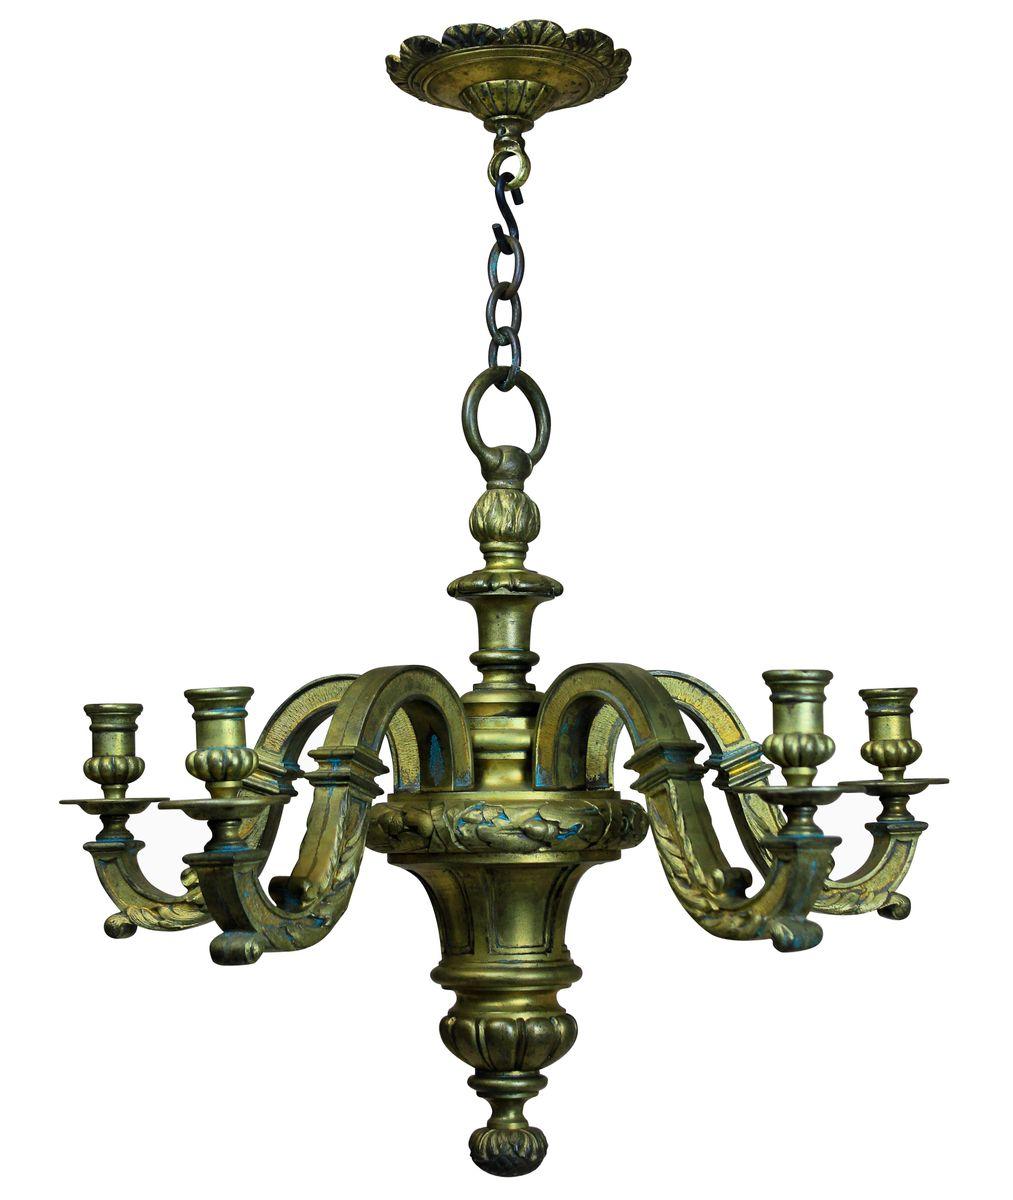 Englischer vergoldeter Bronze Kronleuchter